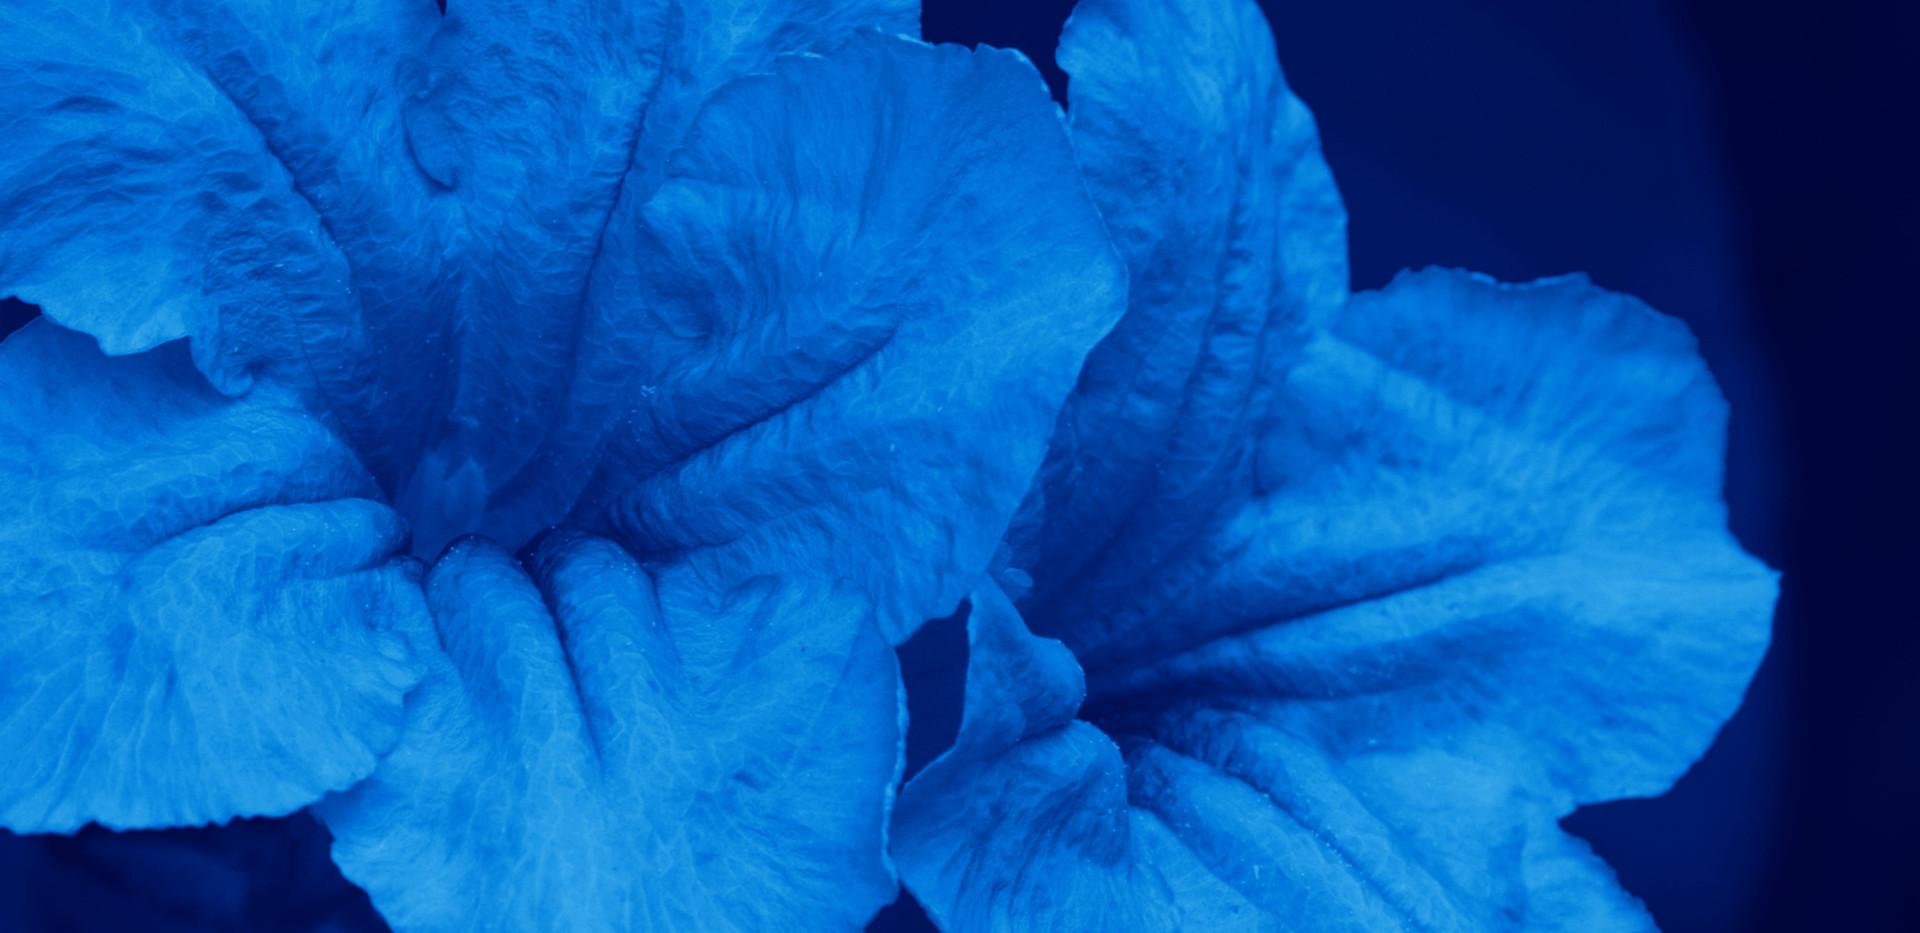 Folie A Deux III (I Bloom Blue Without You)